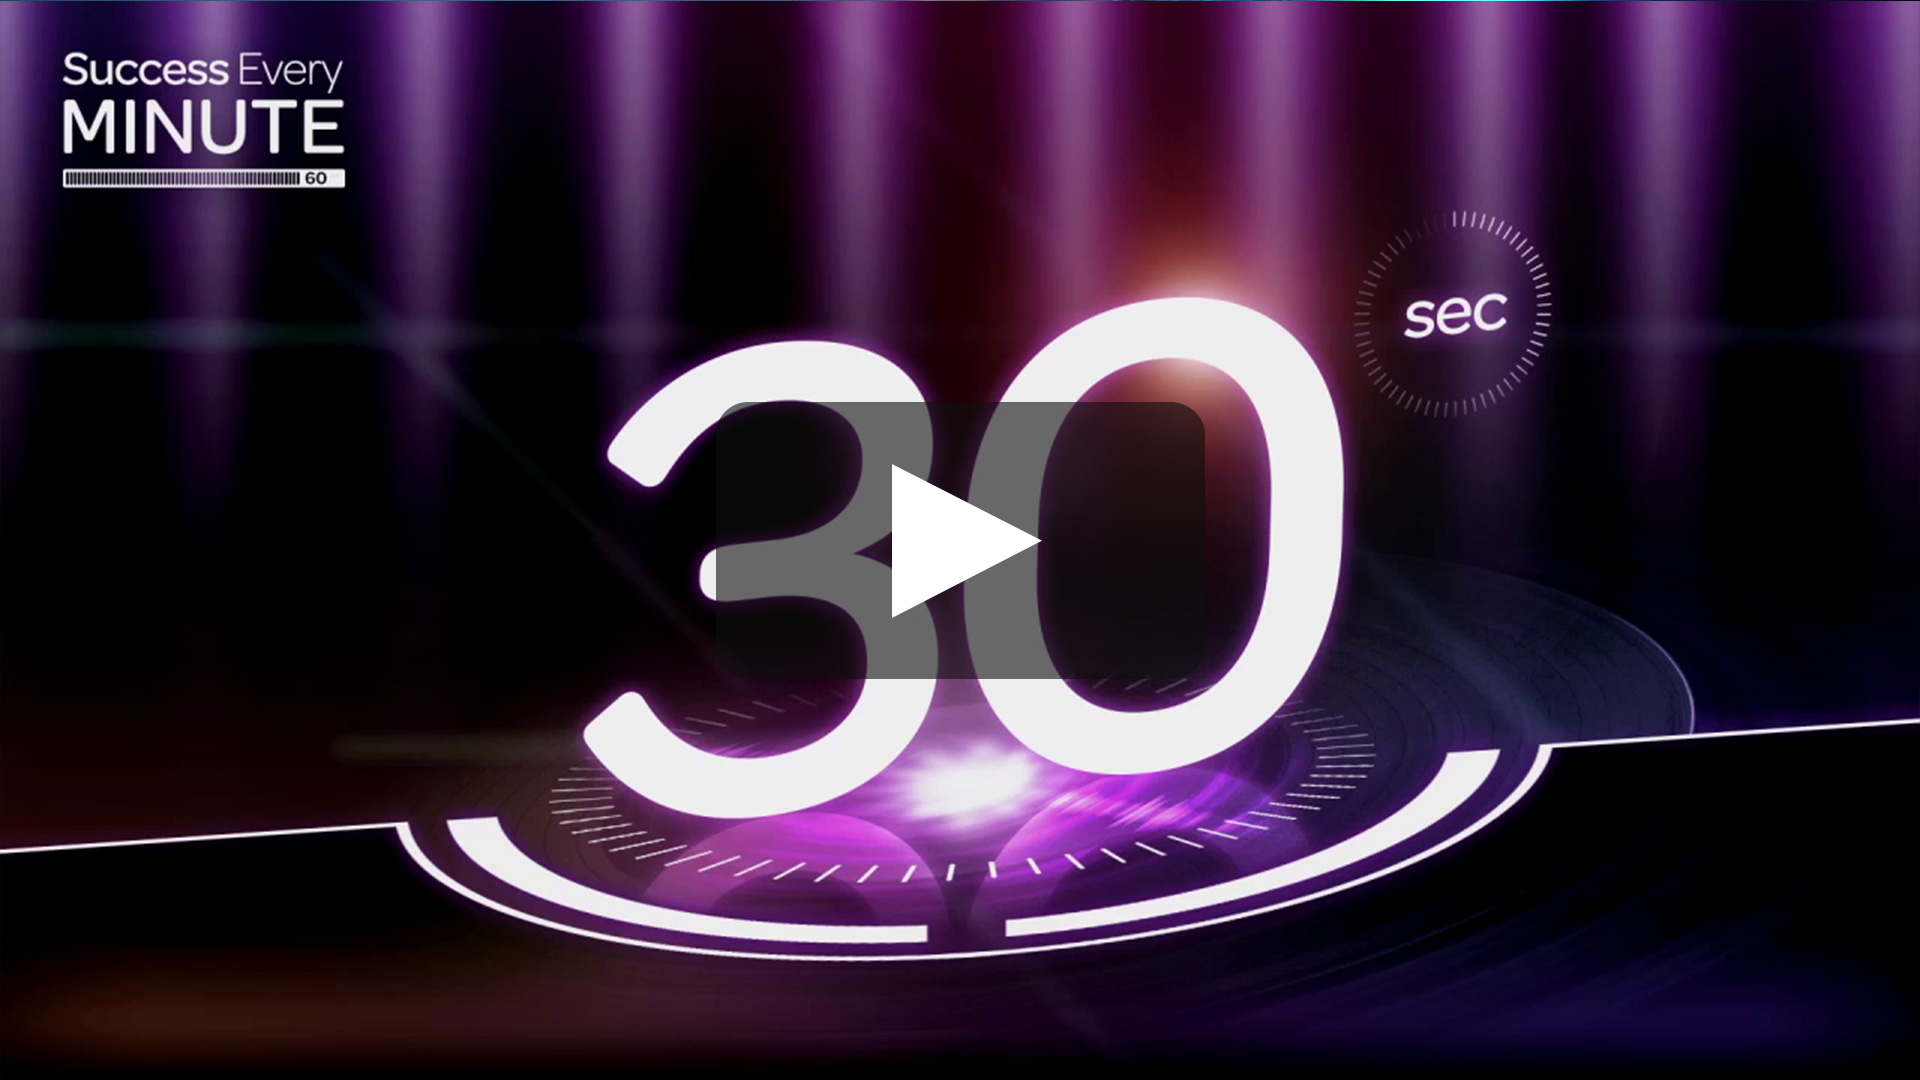 img_video_avid_success_every_minute